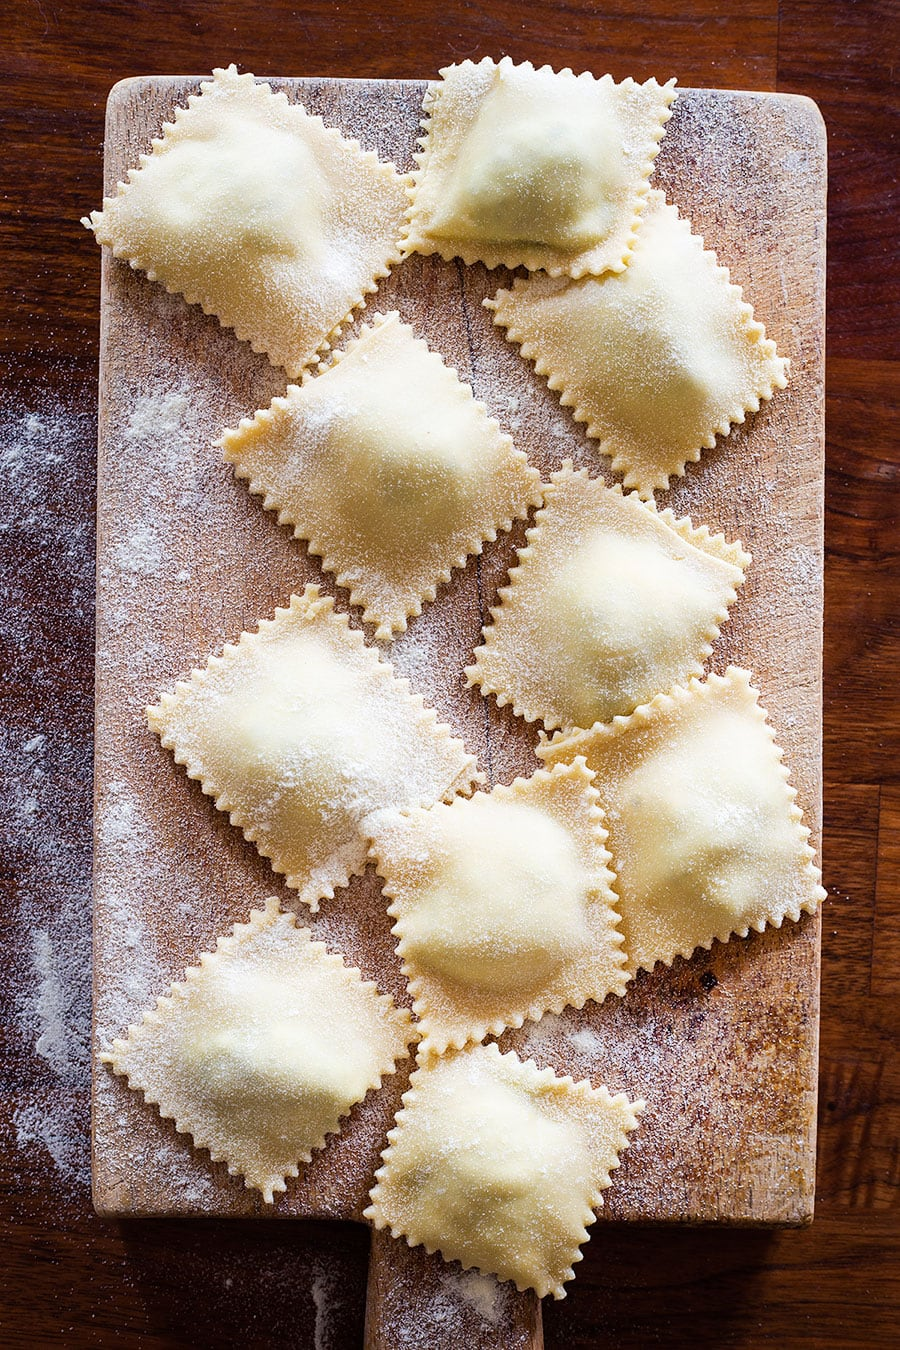 Uncooked ravioli on a cutting board.